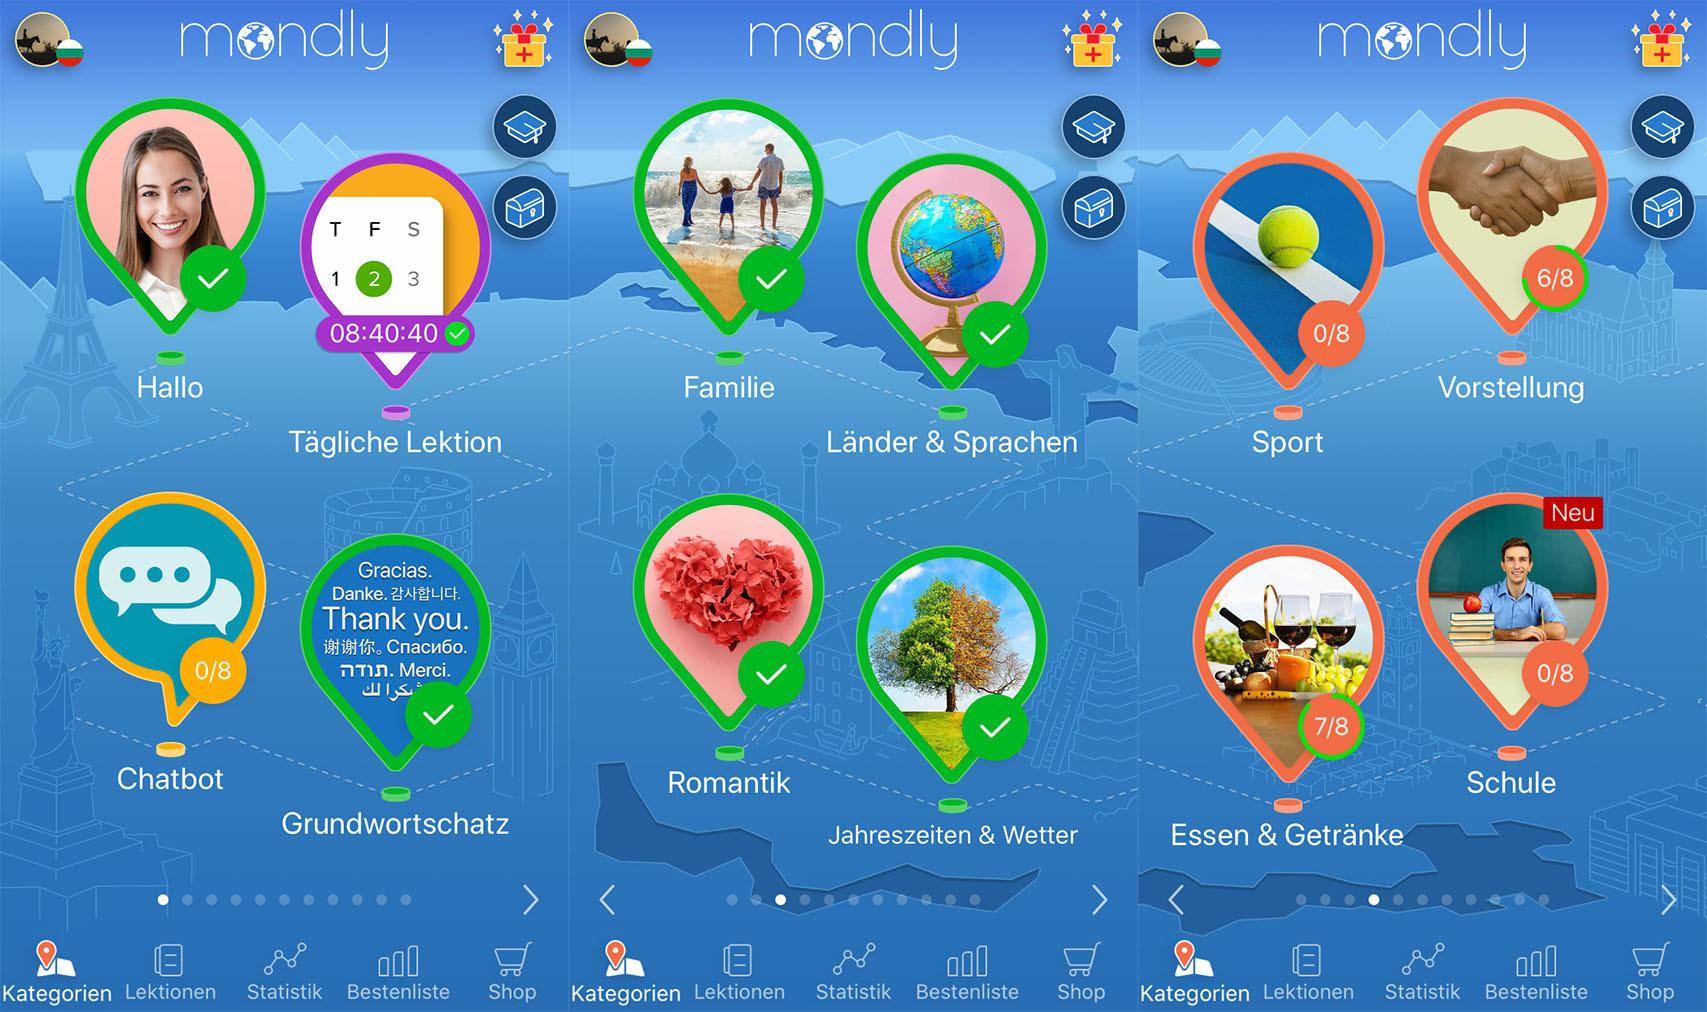 app_mondly_kategorien